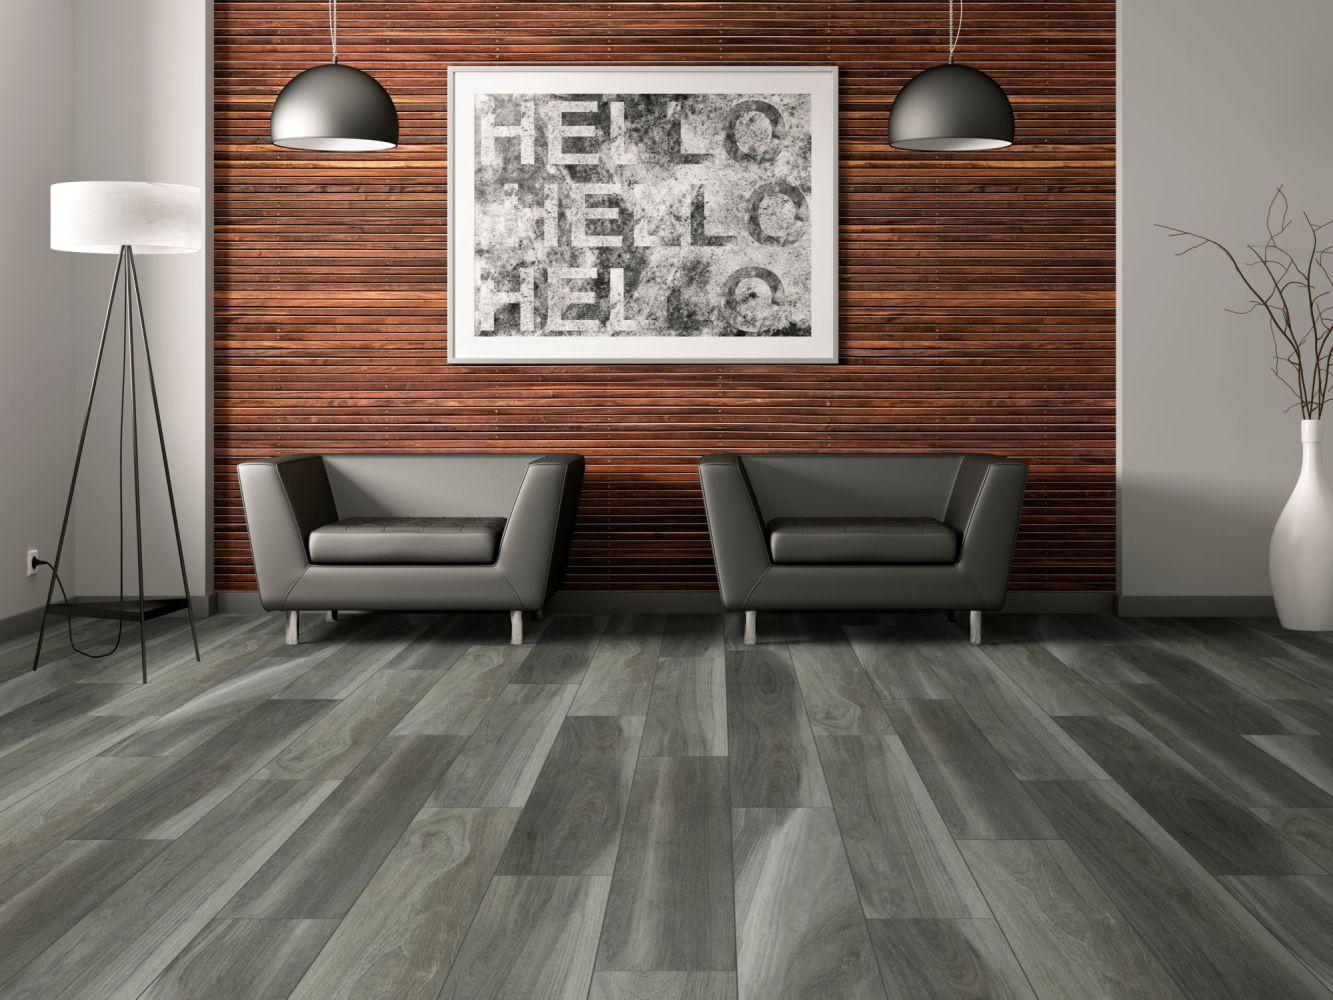 Shaw Floors Reality Homes Lava Beds Charred Oak 05009_110RH